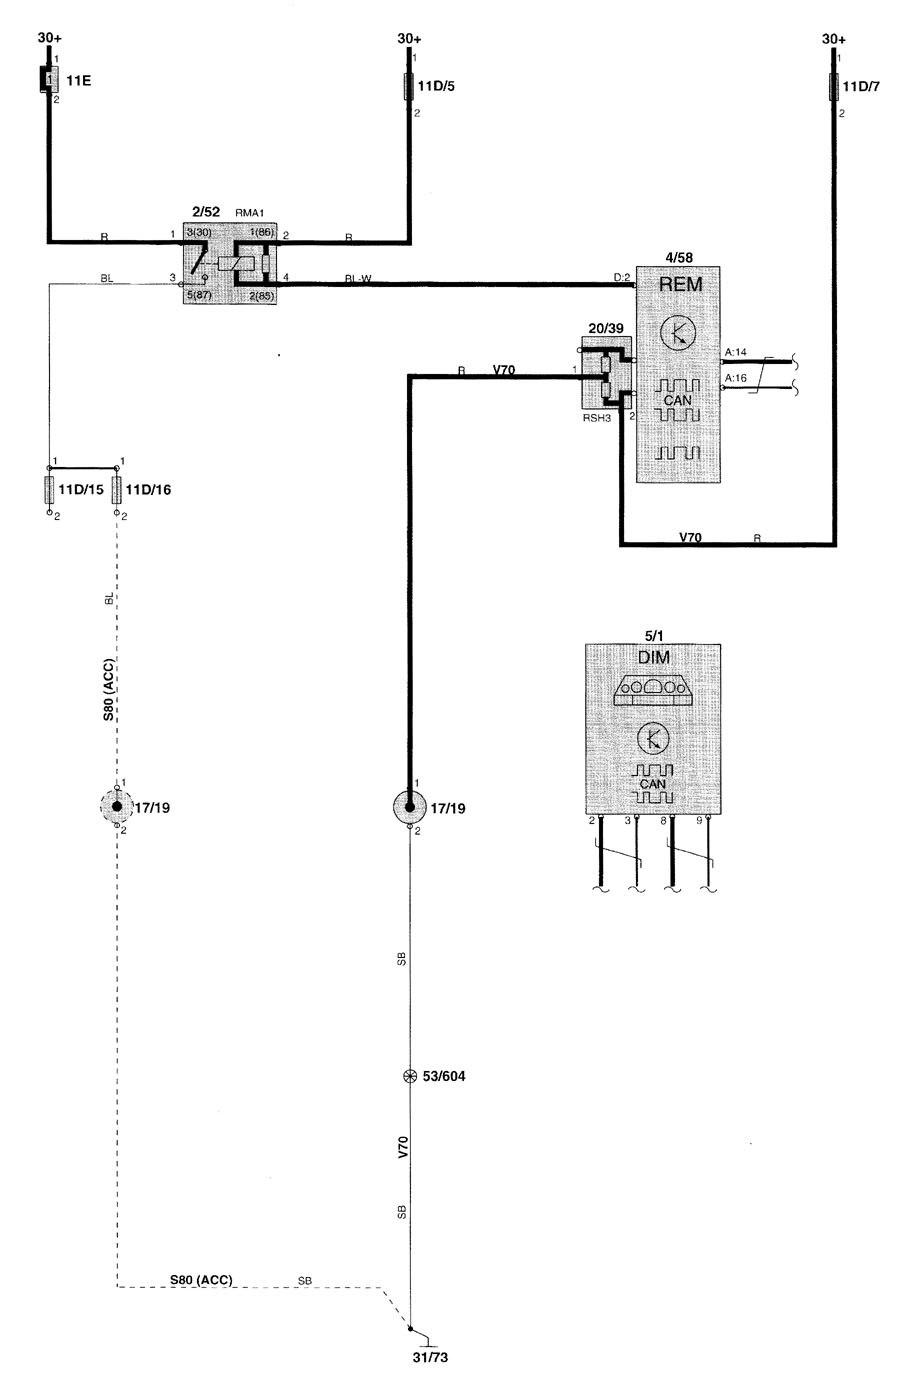 Volvo Xc70 Trailer Wiring Harness   Wiring Diagram on 2004 volvo xc90 wiring diagram, 1995 volvo 960 wiring diagram, 2000 pontiac grand am wiring diagram, 2001 saab 9-5 wiring diagram, 2001 kia rio wiring diagram, 2003 nissan sentra wiring diagram, 2001 honda s2000 wiring diagram, 2001 pontiac aztek wiring diagram, 1995 volvo 850 wiring diagram, 2001 toyota avalon wiring diagram, 2001 toyota sequoia wiring diagram, 2002 oldsmobile bravada wiring diagram, 2007 saturn aura wiring diagram, volvo t5 engine diagram, 2001 acura tl wiring diagram, 2001 toyota rav4 wiring diagram, 1988 buick lesabre wiring diagram, 2001 pontiac grand am wiring diagram, 2001 honda prelude wiring diagram, 2001 audi tt wiring diagram,